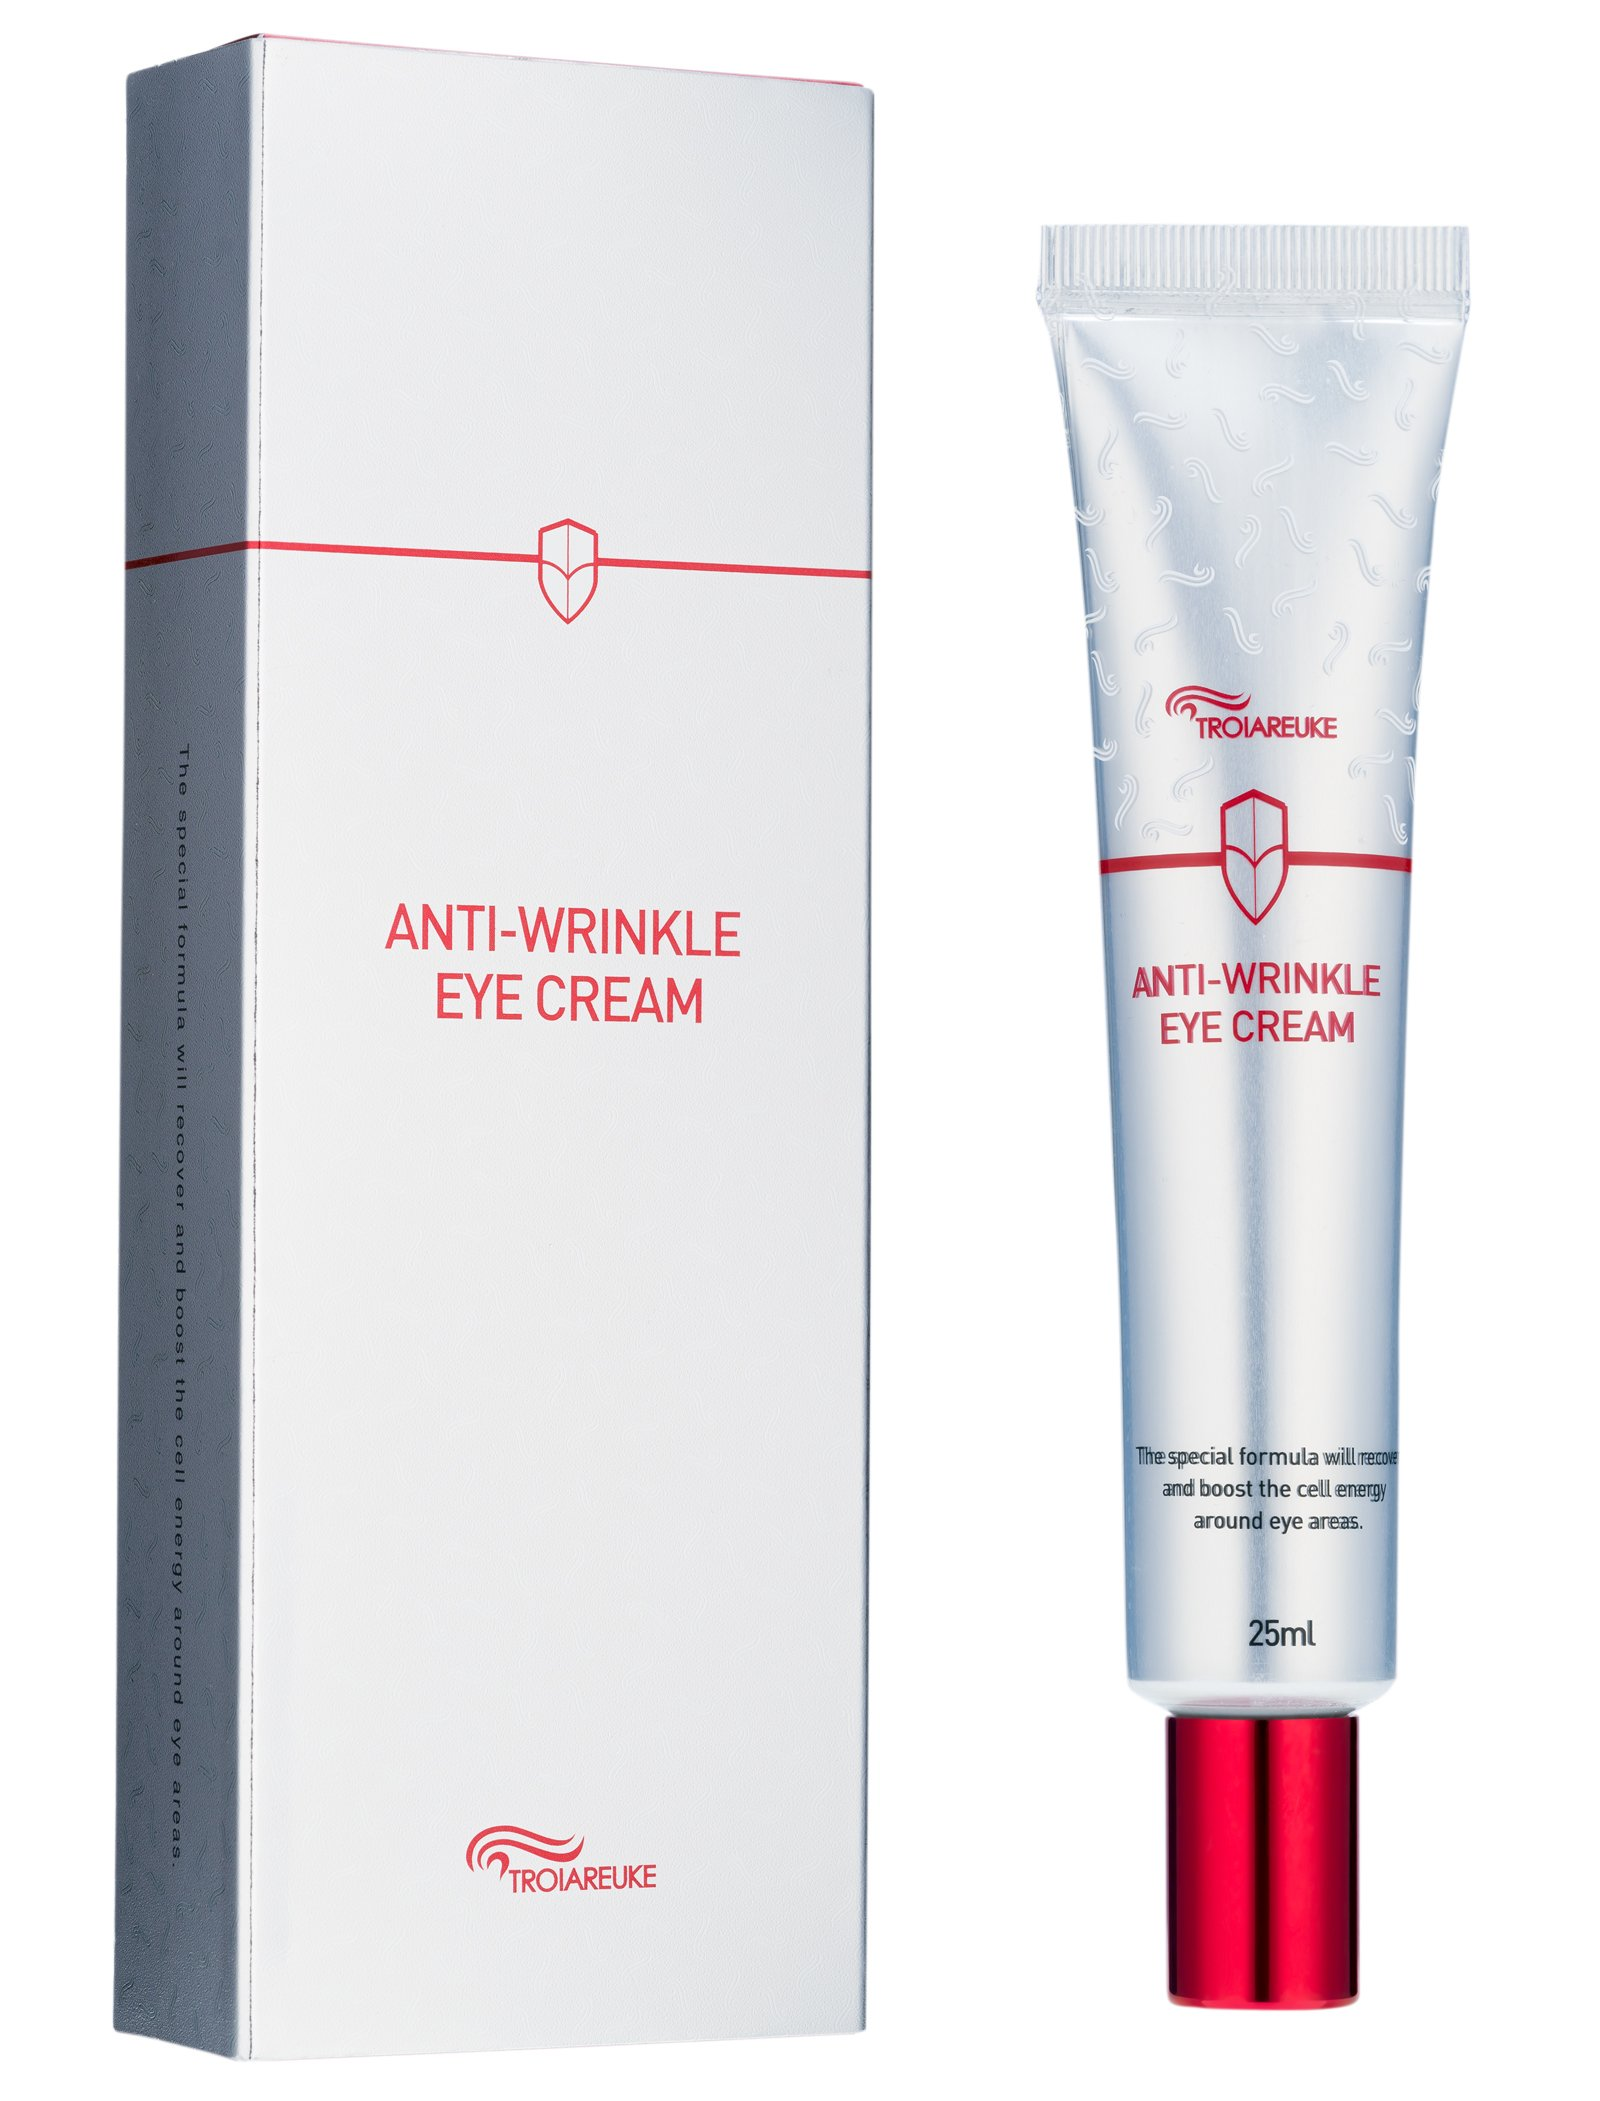 [TROIAREUKE] Anti- Wrinkle Eye Cream 25ml / peptide cream, wrinkle care, dark circle